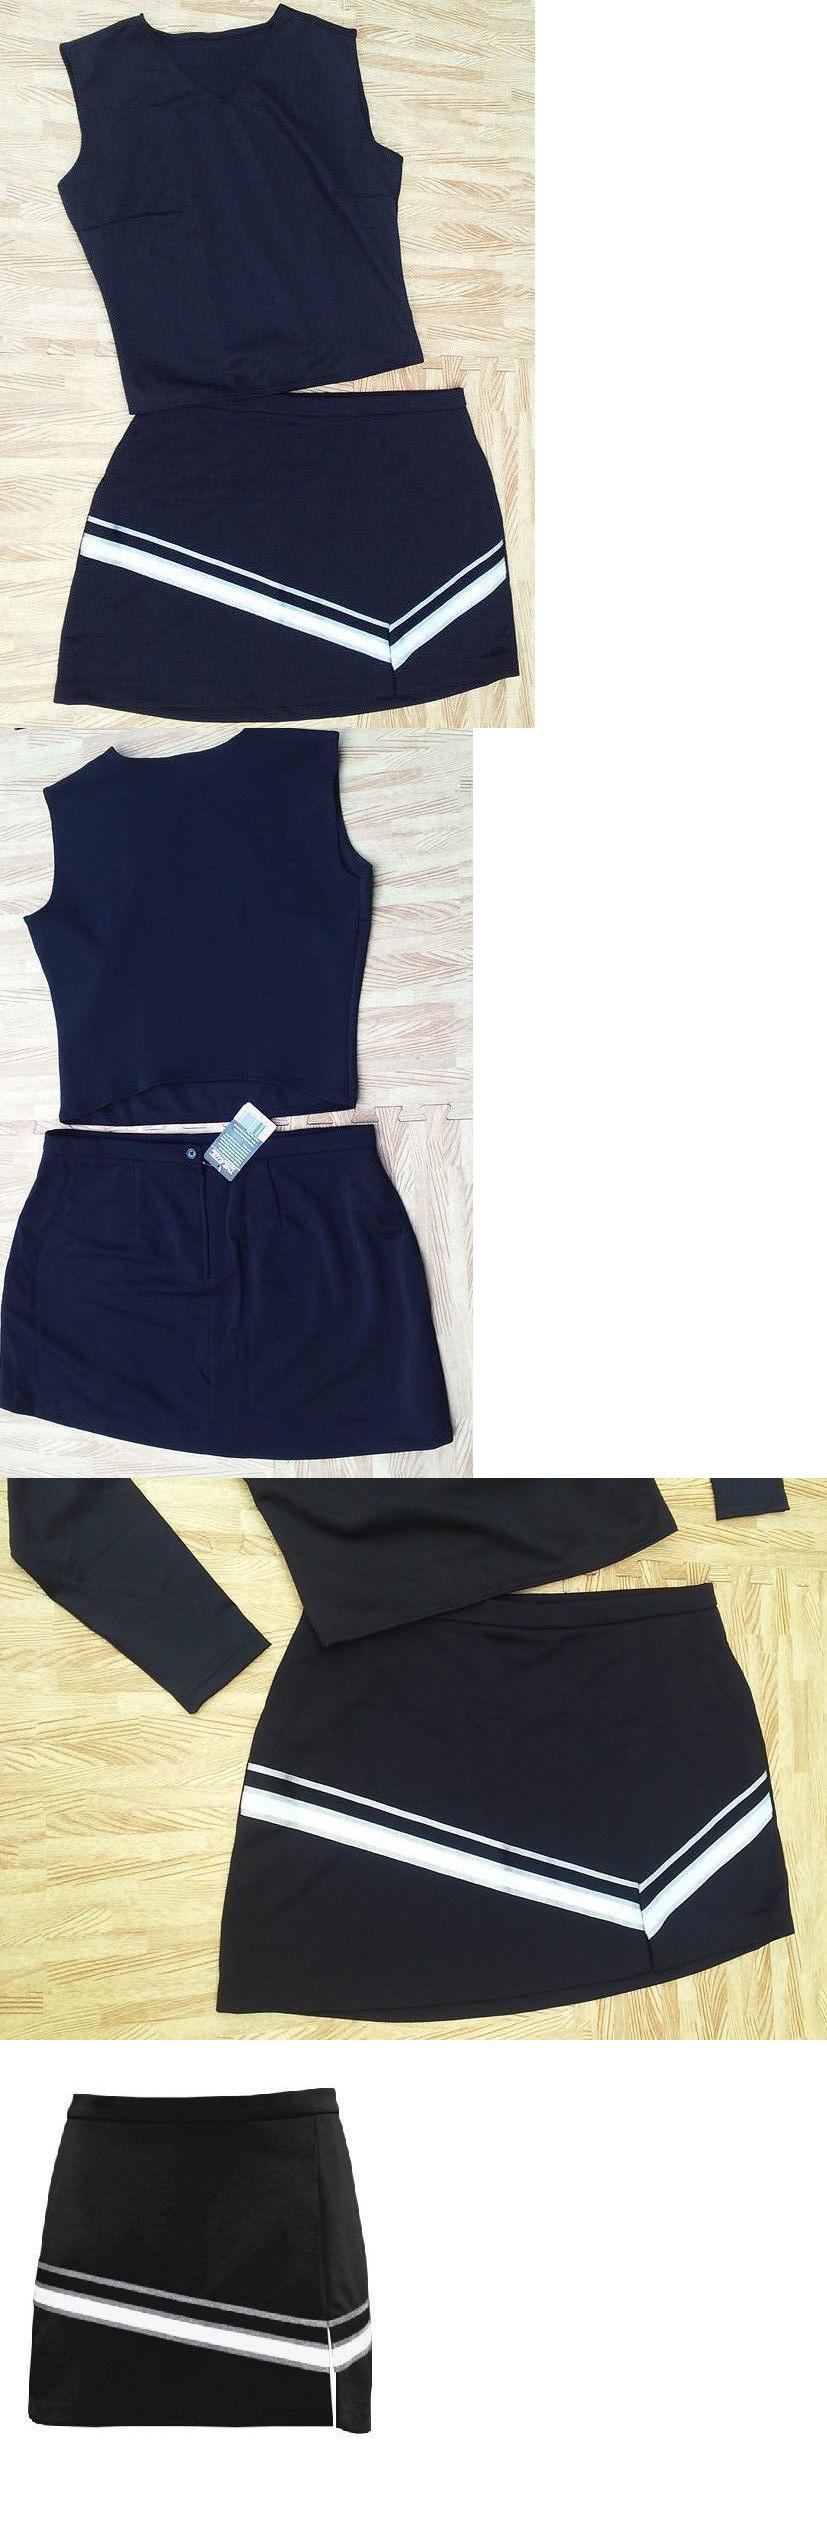 4516456150c Cheerleading 66832  Sexy Adult Plus 2Xl 18 20 Black Cheerleader Uniform Top  Skirt 42-